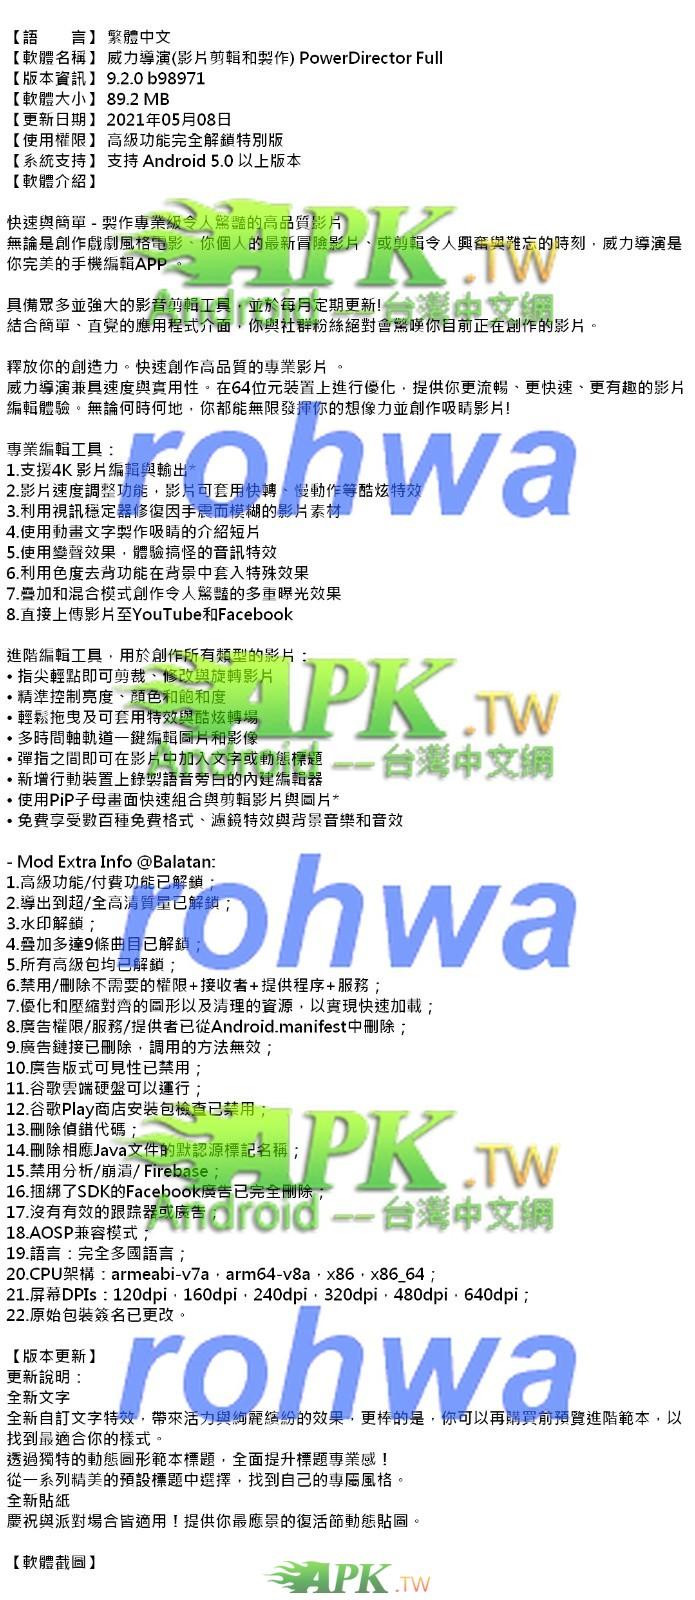 PowerDirector_Premium_9.2.0 APK_.jpg